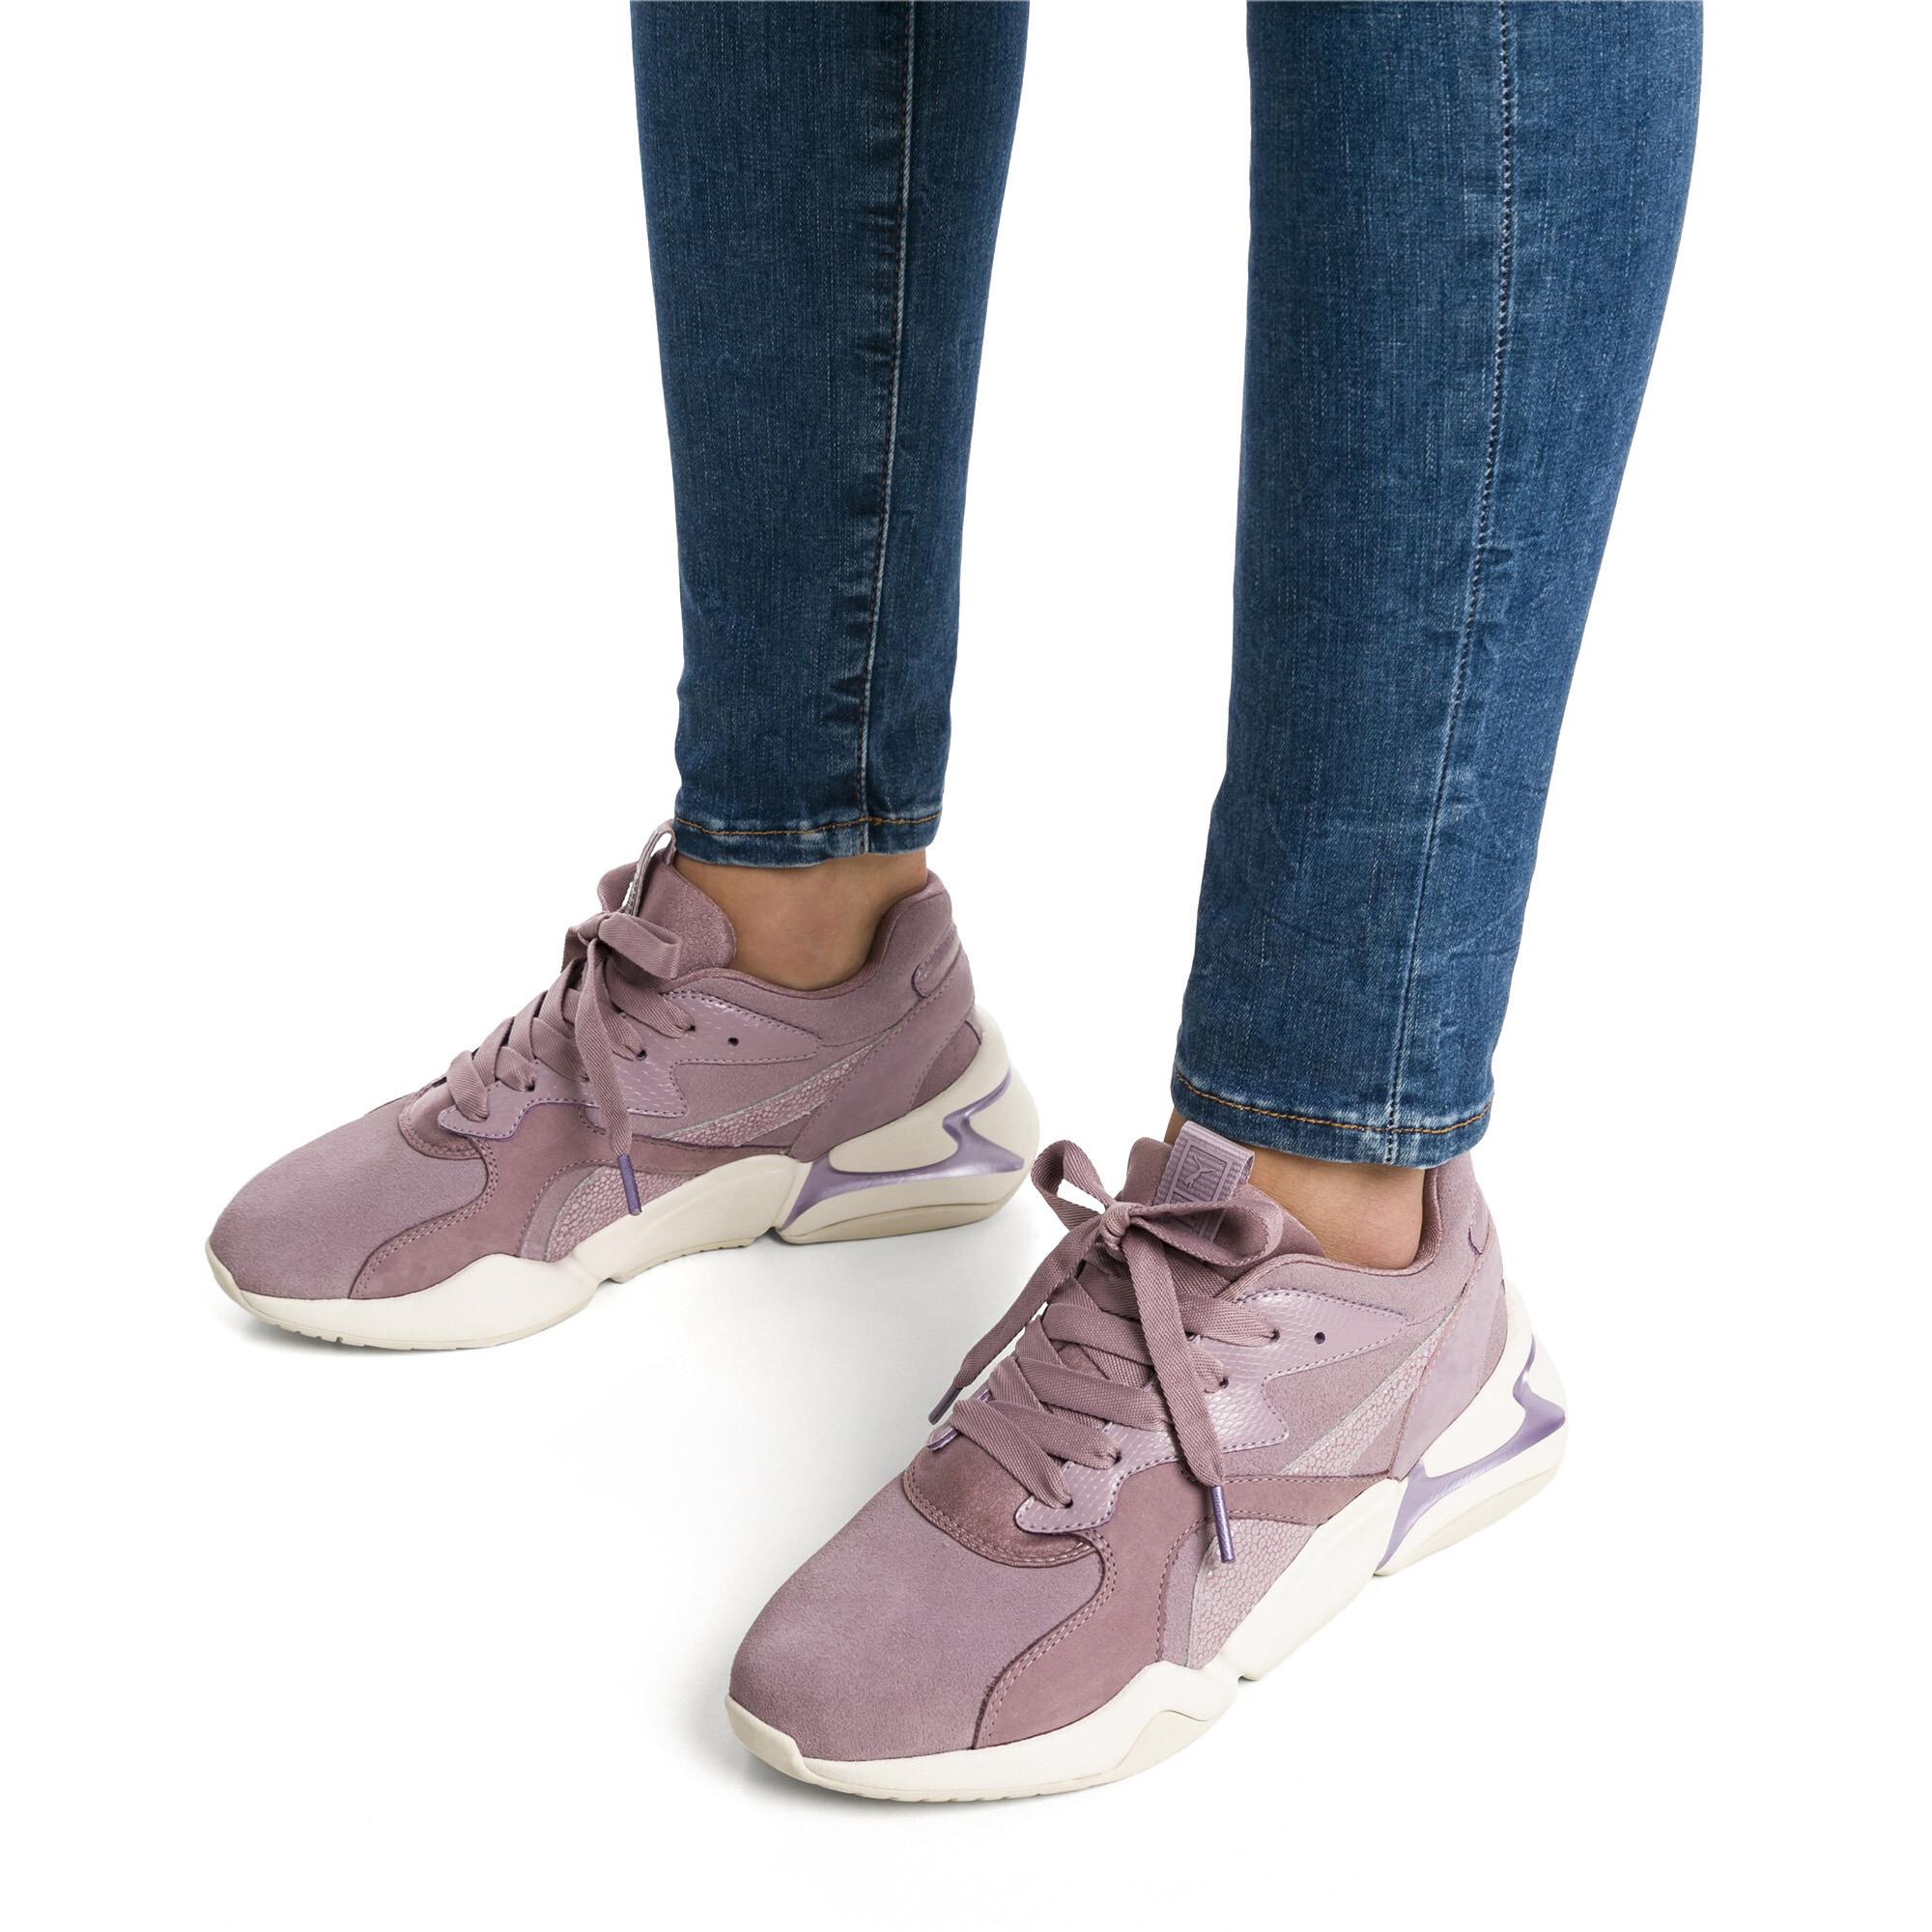 Image Puma Nova Pastel Grunge Women's Sneakers #2